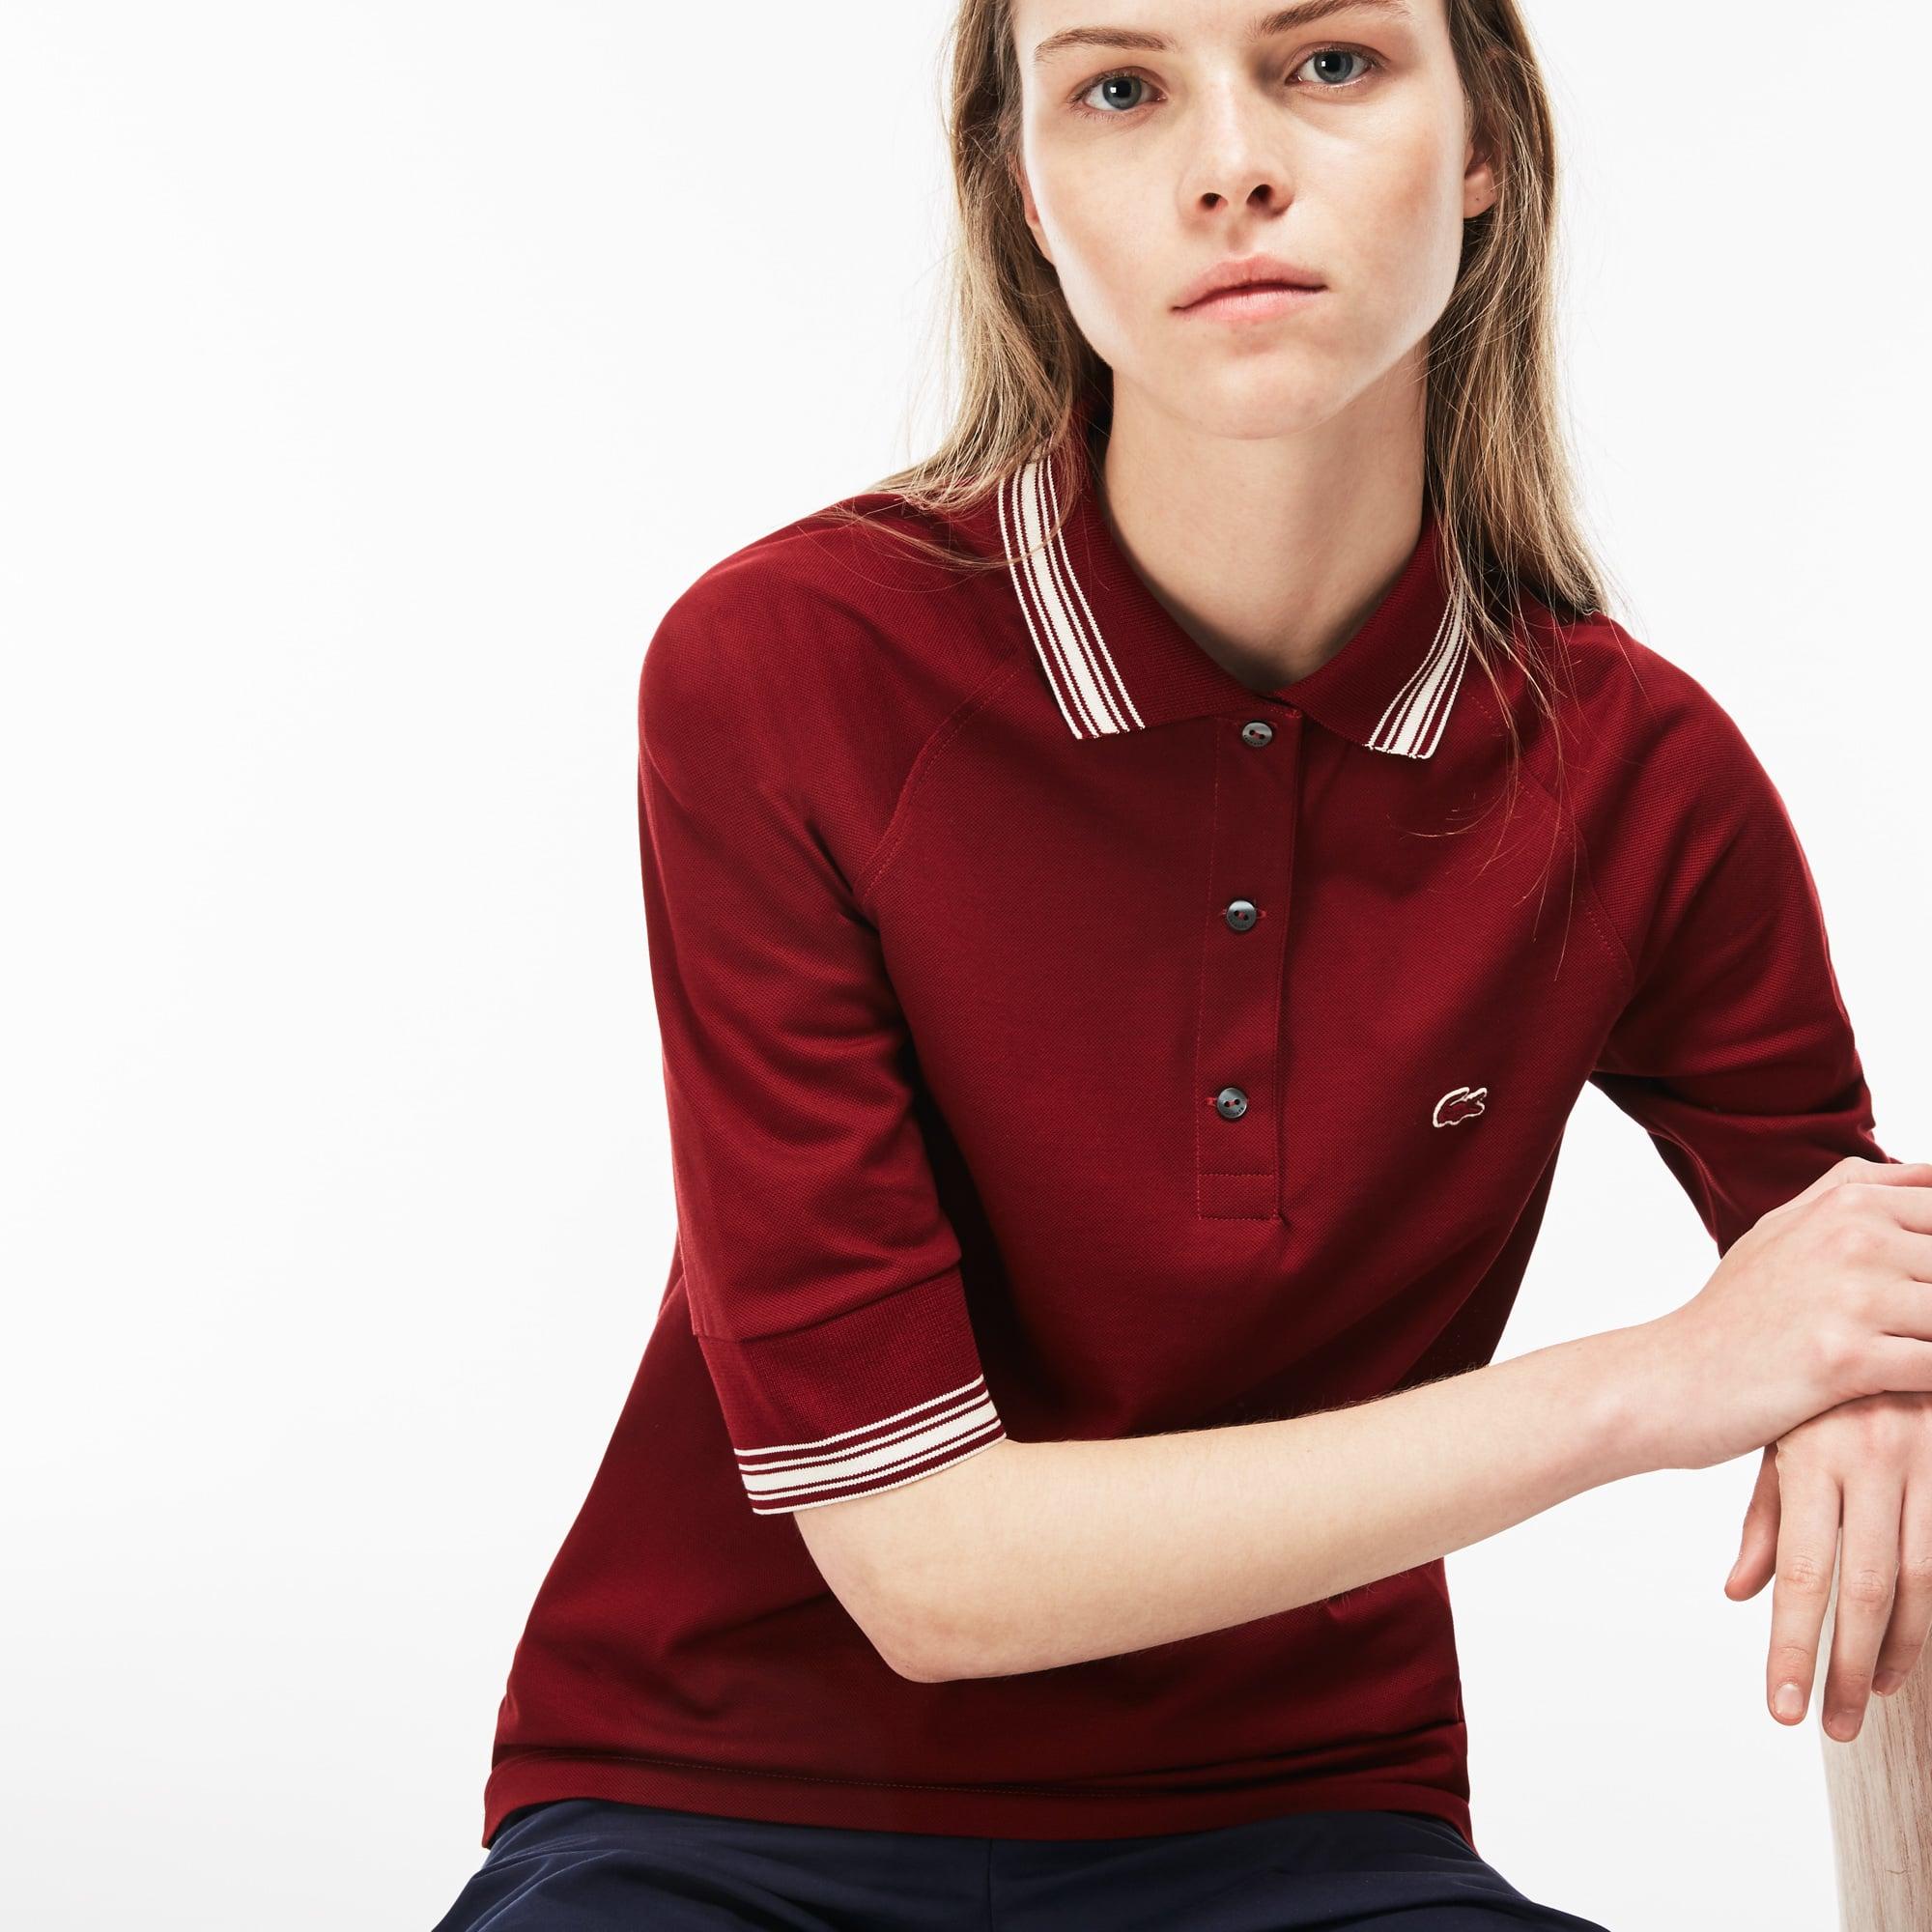 LACOSTE Damen-Poloshirt aus Piqué mit Paspeln